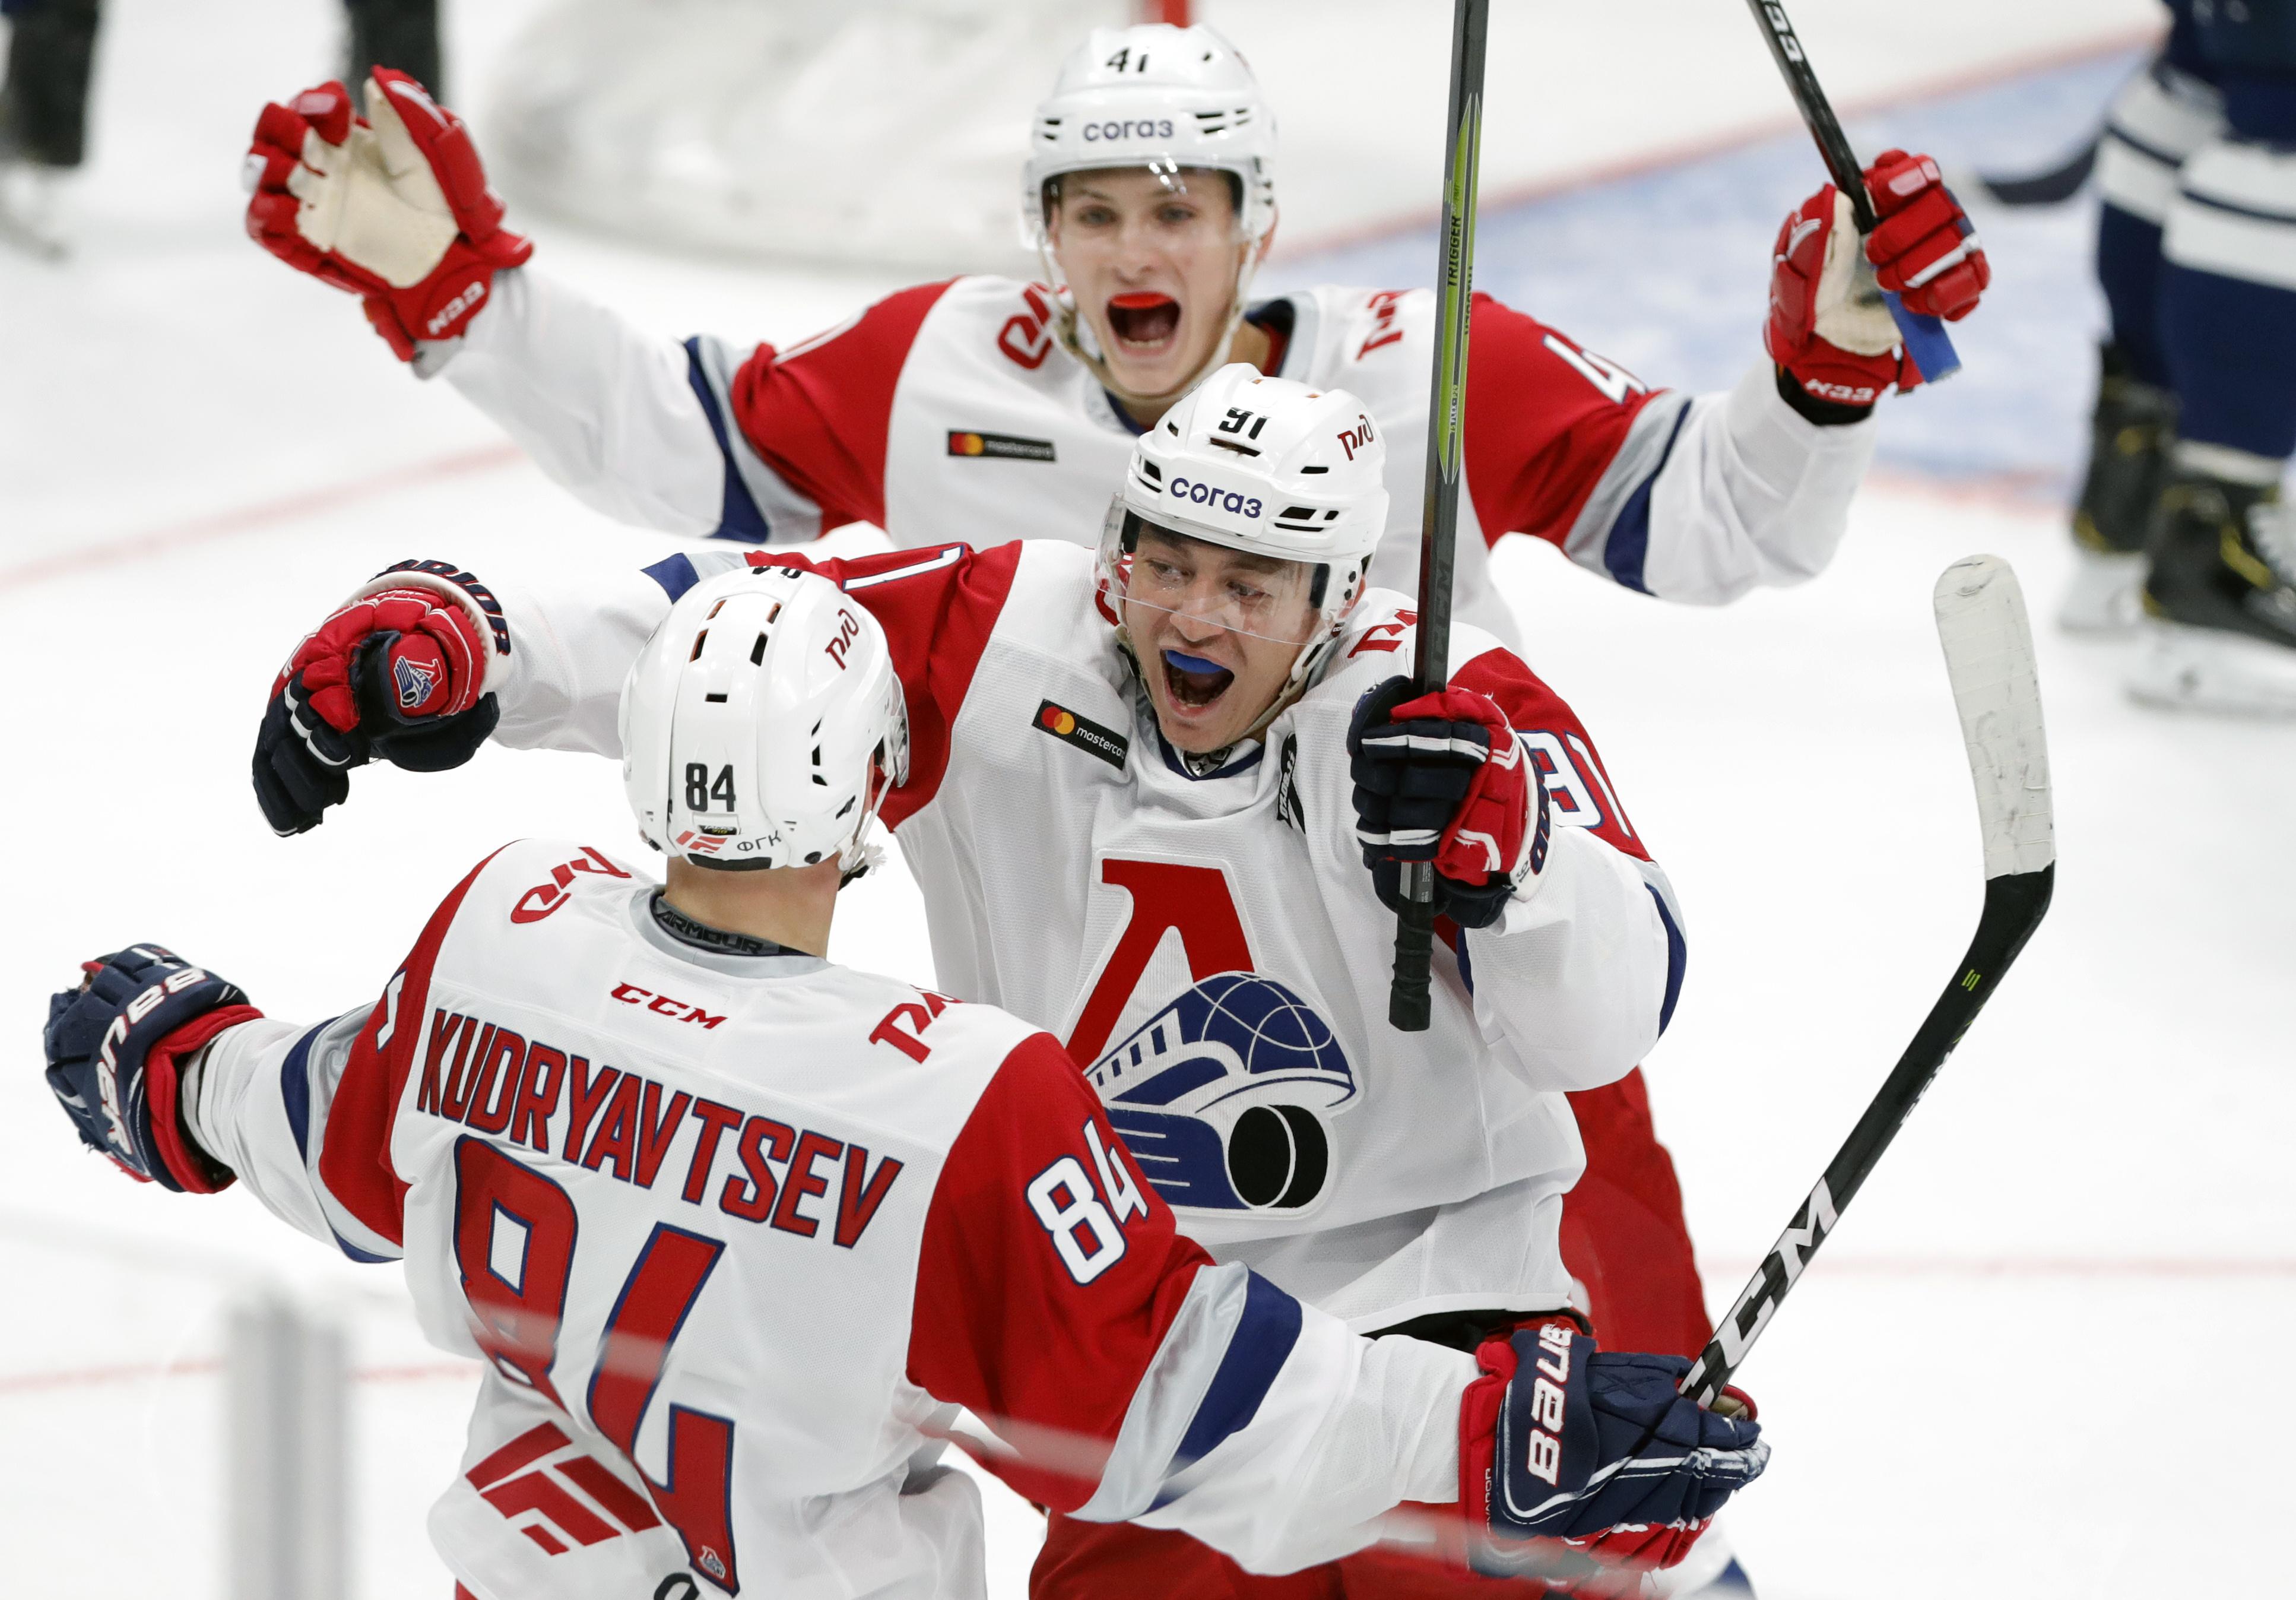 Kontinental Hockey League: Dynamo Moscow vs Lokomotiv Yaroslavl